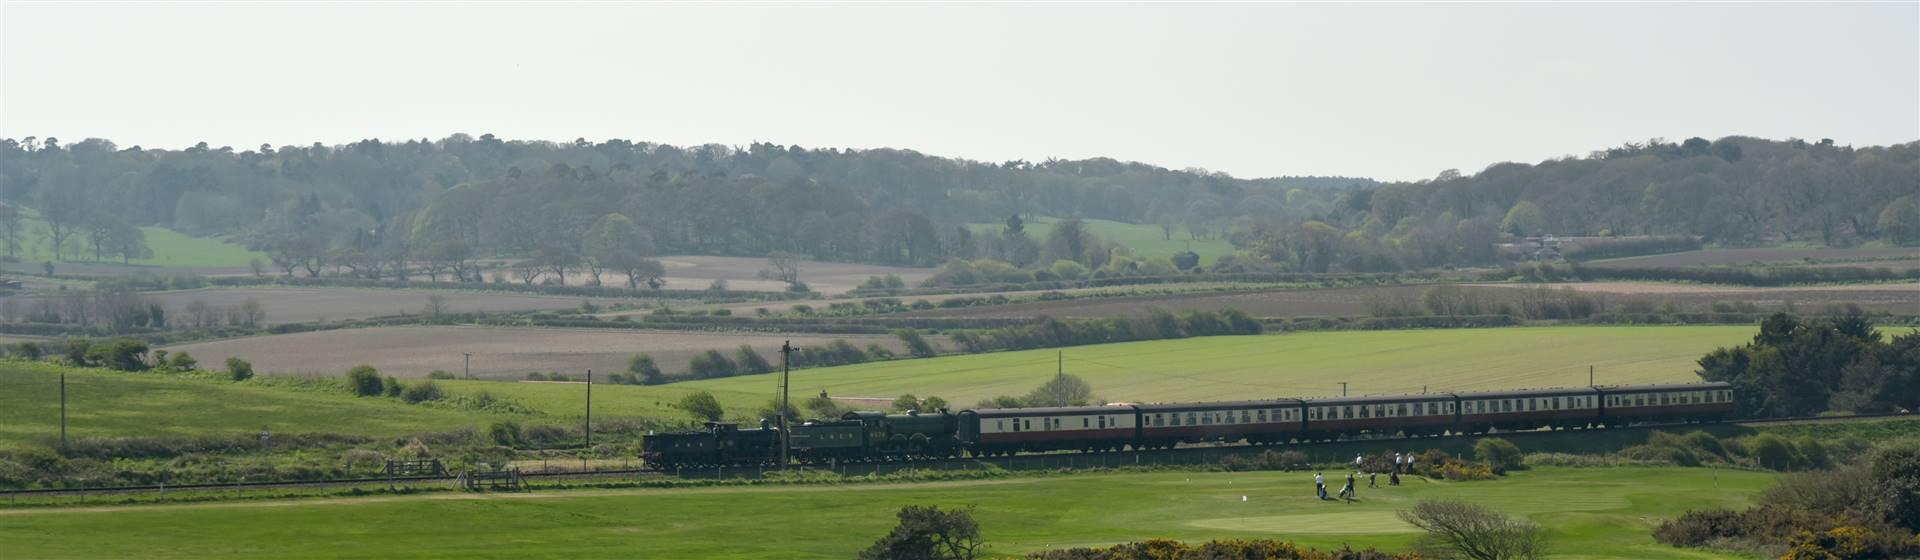 "<img src=""northnorfolkrailway2-adobestock_208869569.jpeg"" alt=""North Norfolk Railway""/>"